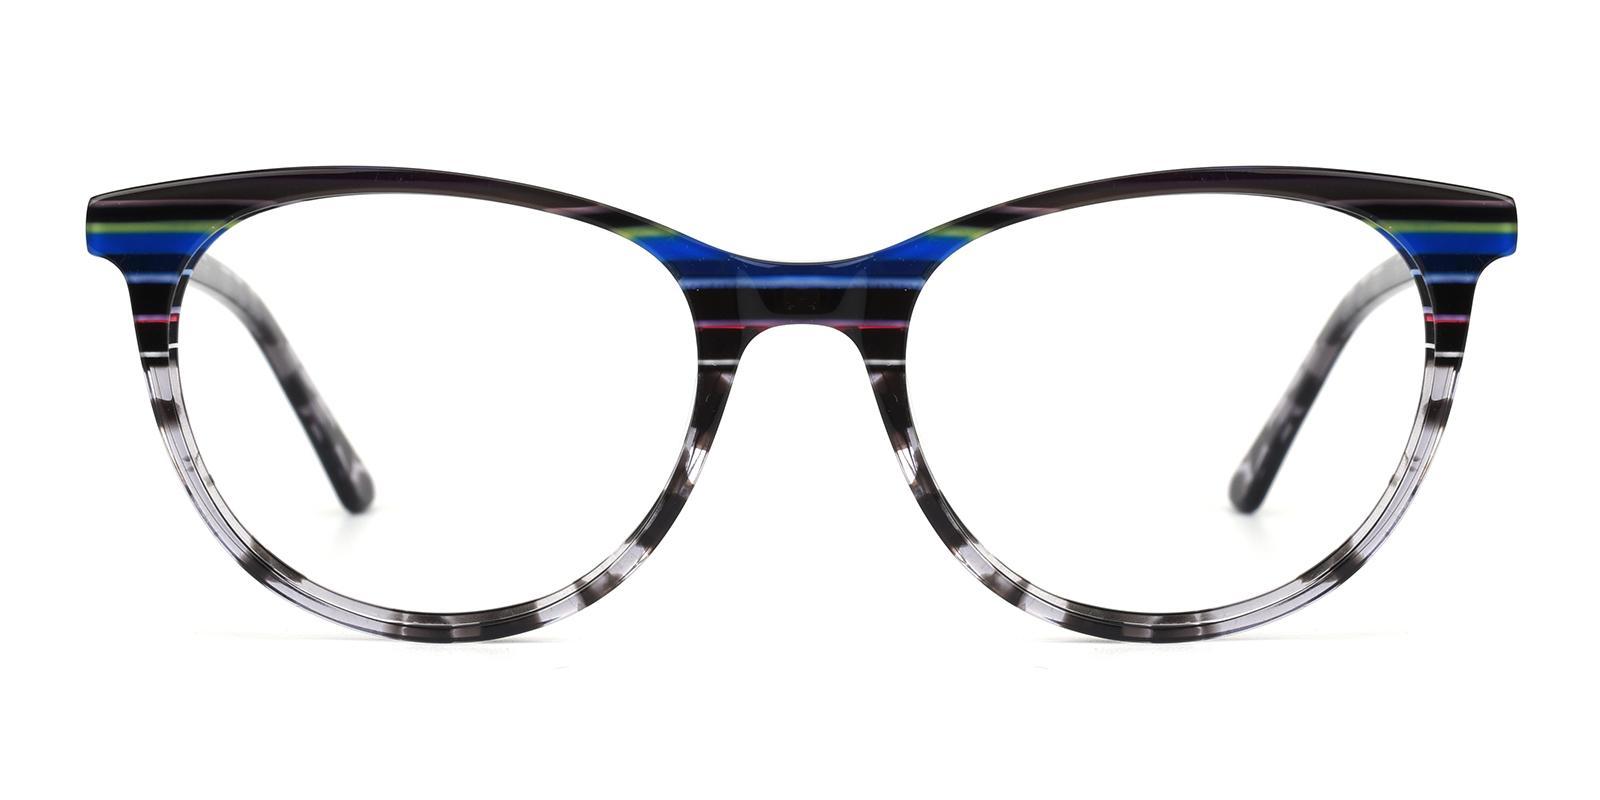 Lankas-Black-Cat-Acetate-Eyeglasses-additional2